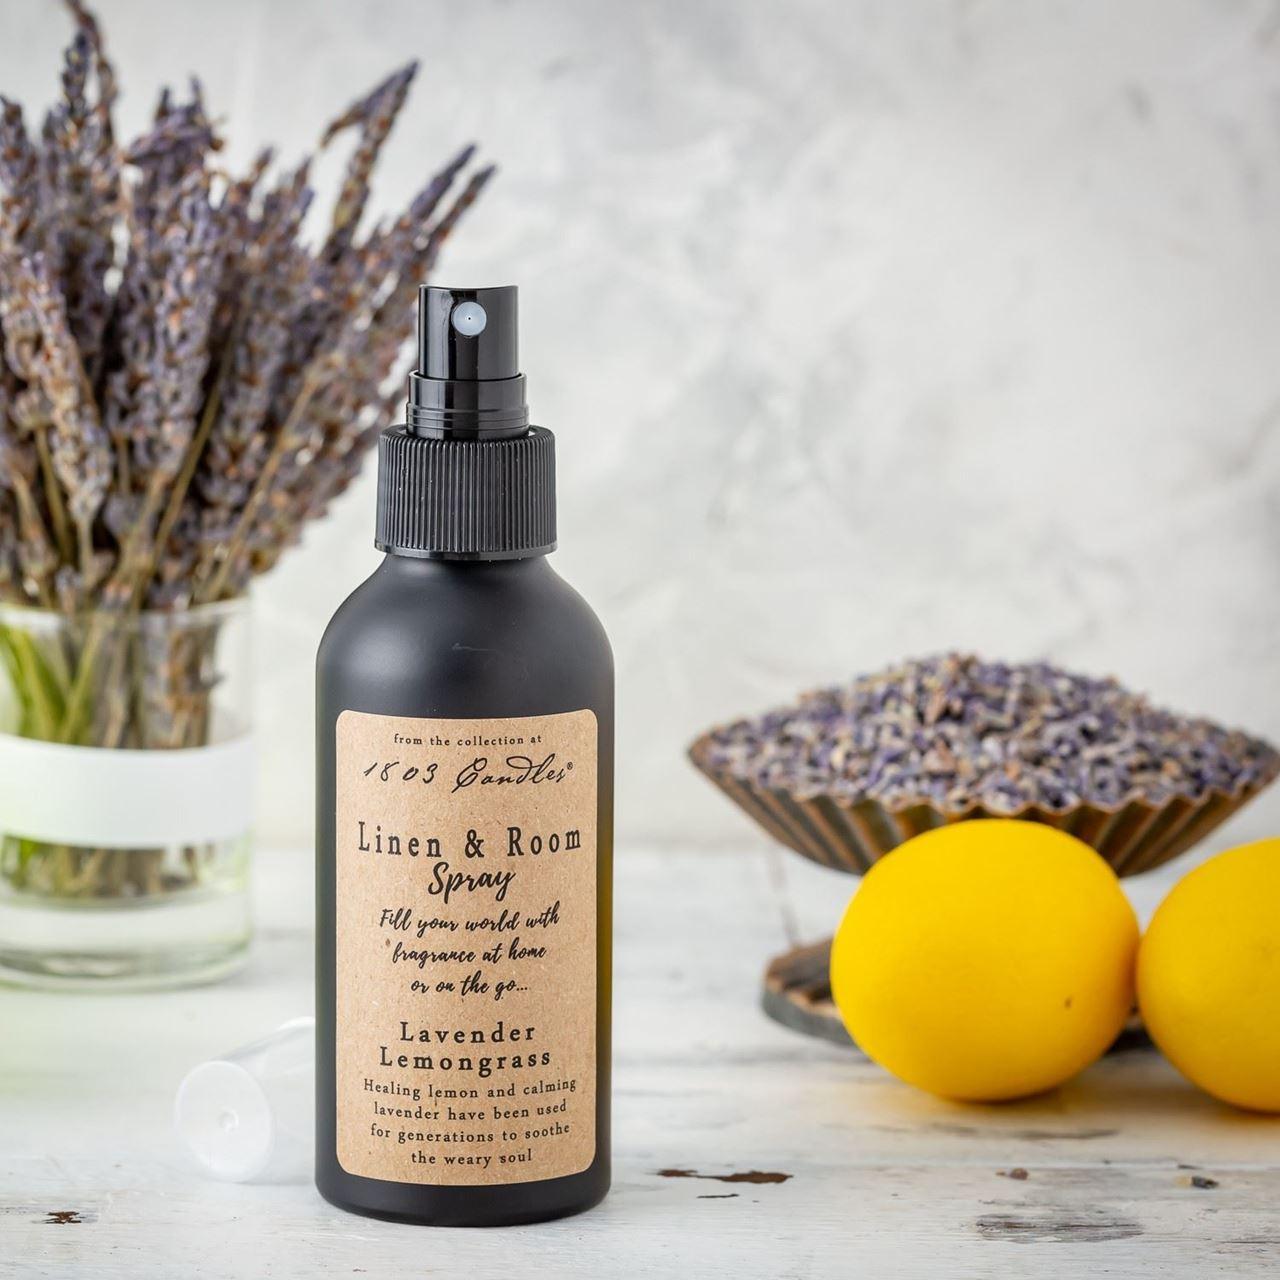 Lavender Lemongrass Linen & Room Spray by 1803 Candles